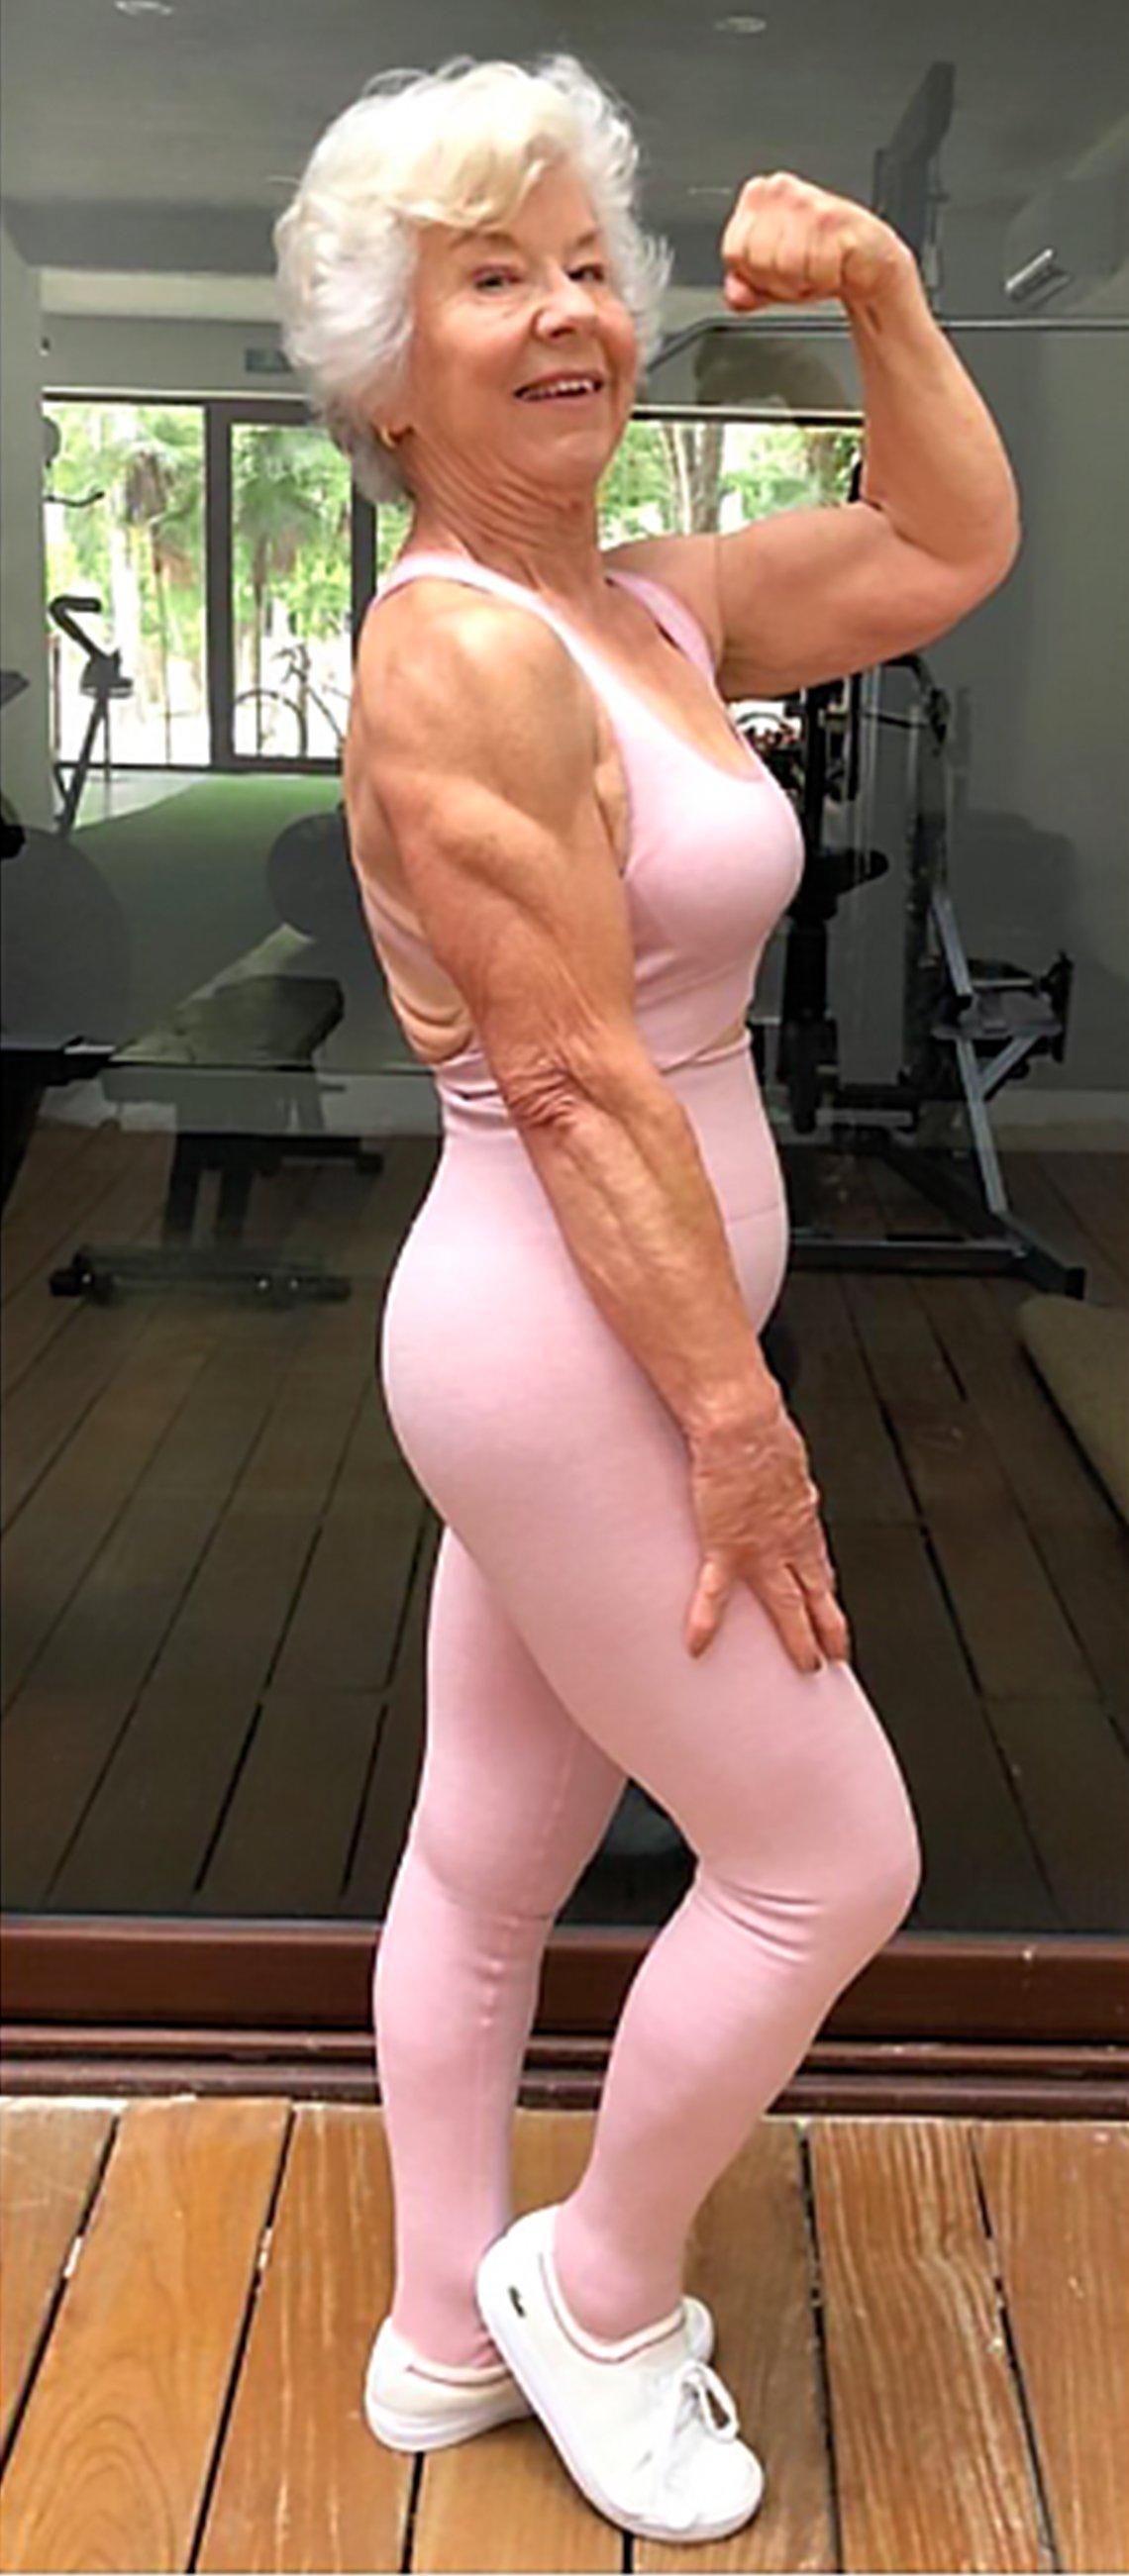 joan macdonald flexing muscles